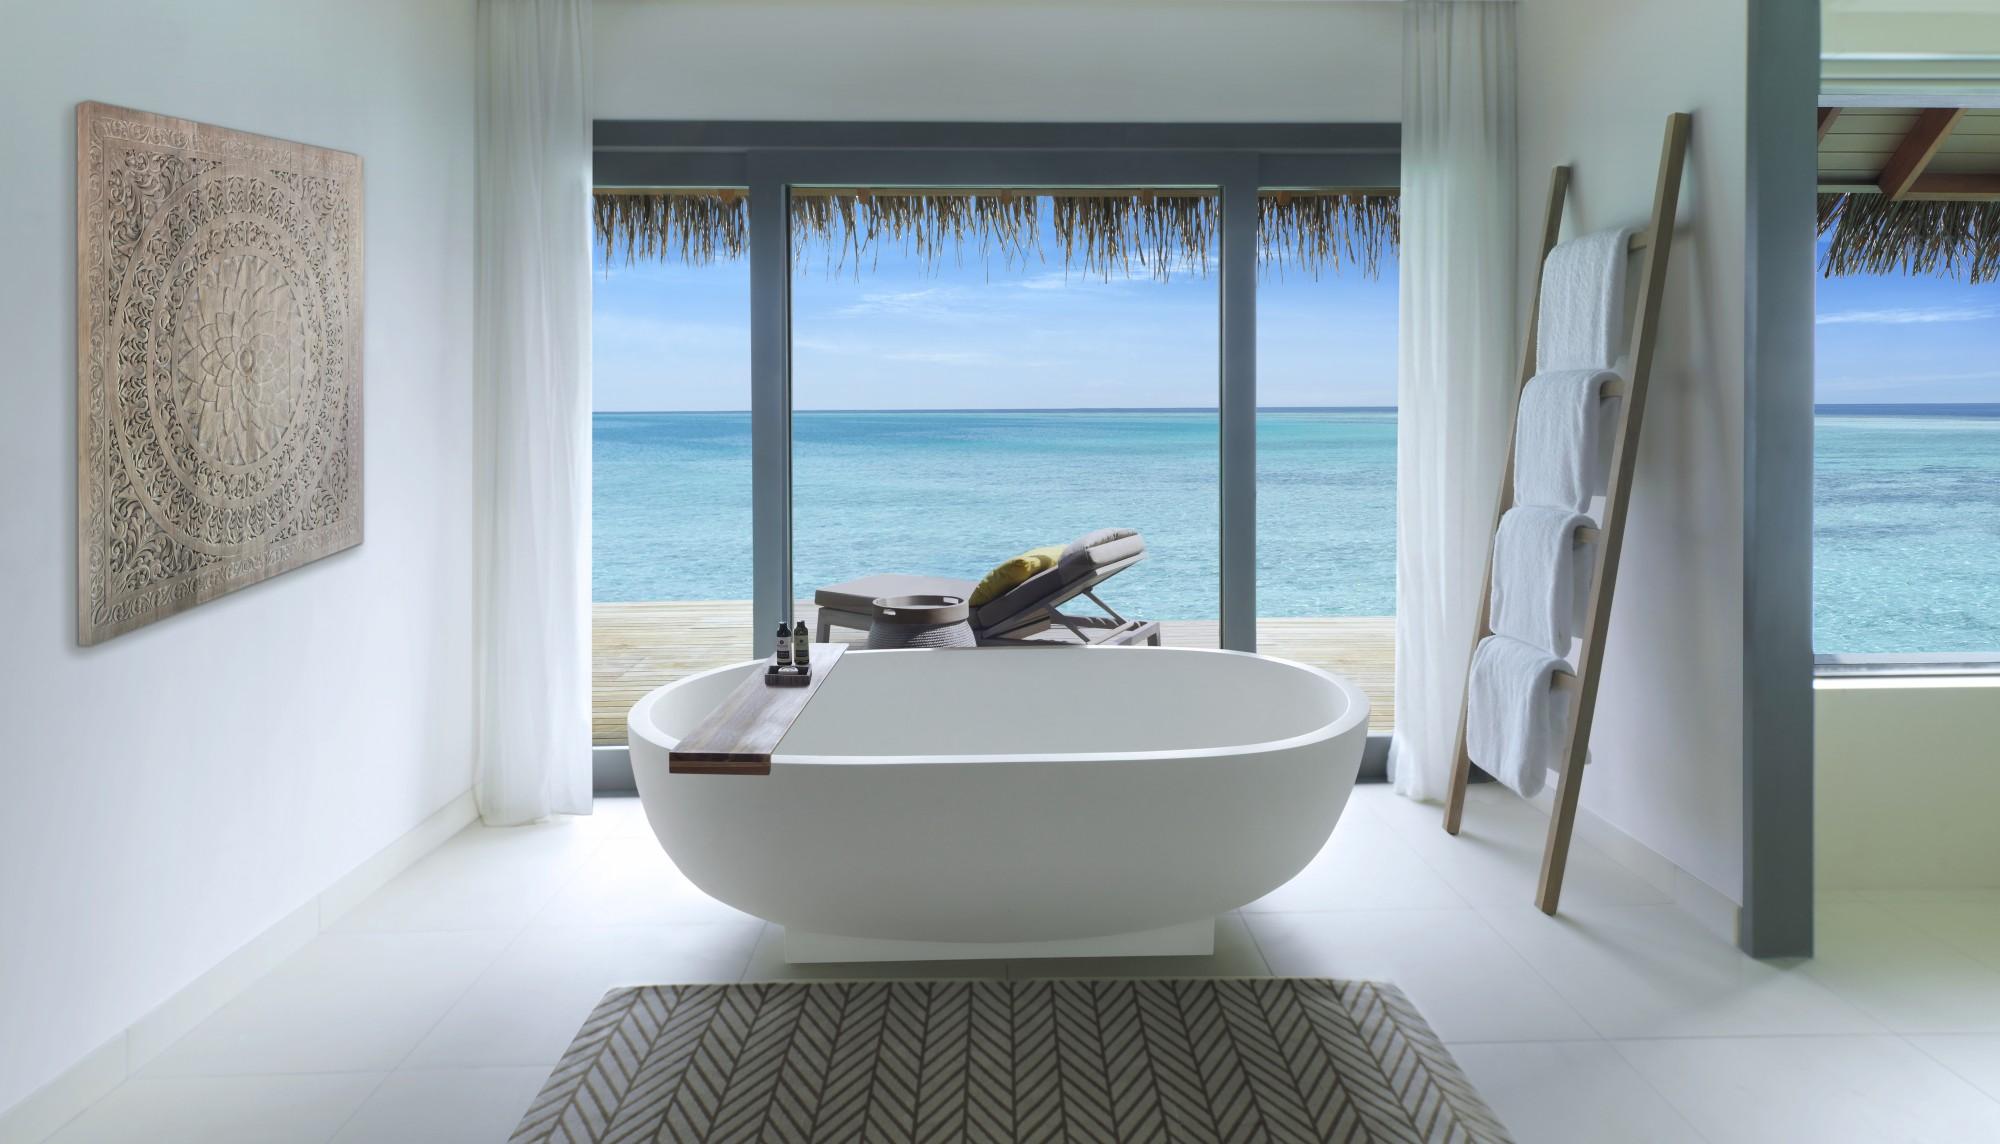 https://www.otdesign.com/wp-content/uploads/2020/11/OTdesign_Vakkaru_over-water-villa-bathroom.jpg